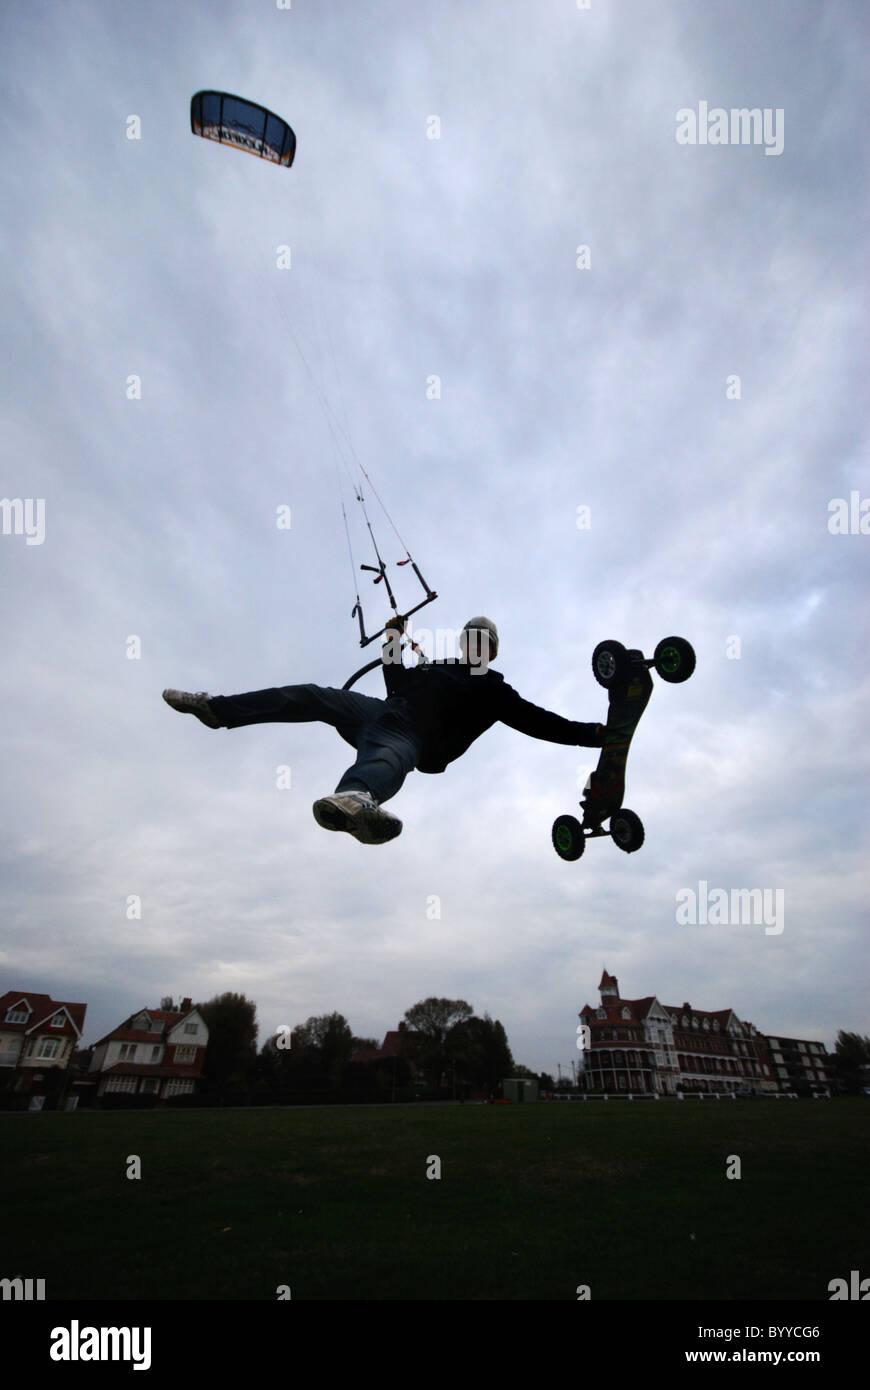 Extreme sport kiteboarding on Frinton green. - Stock Image